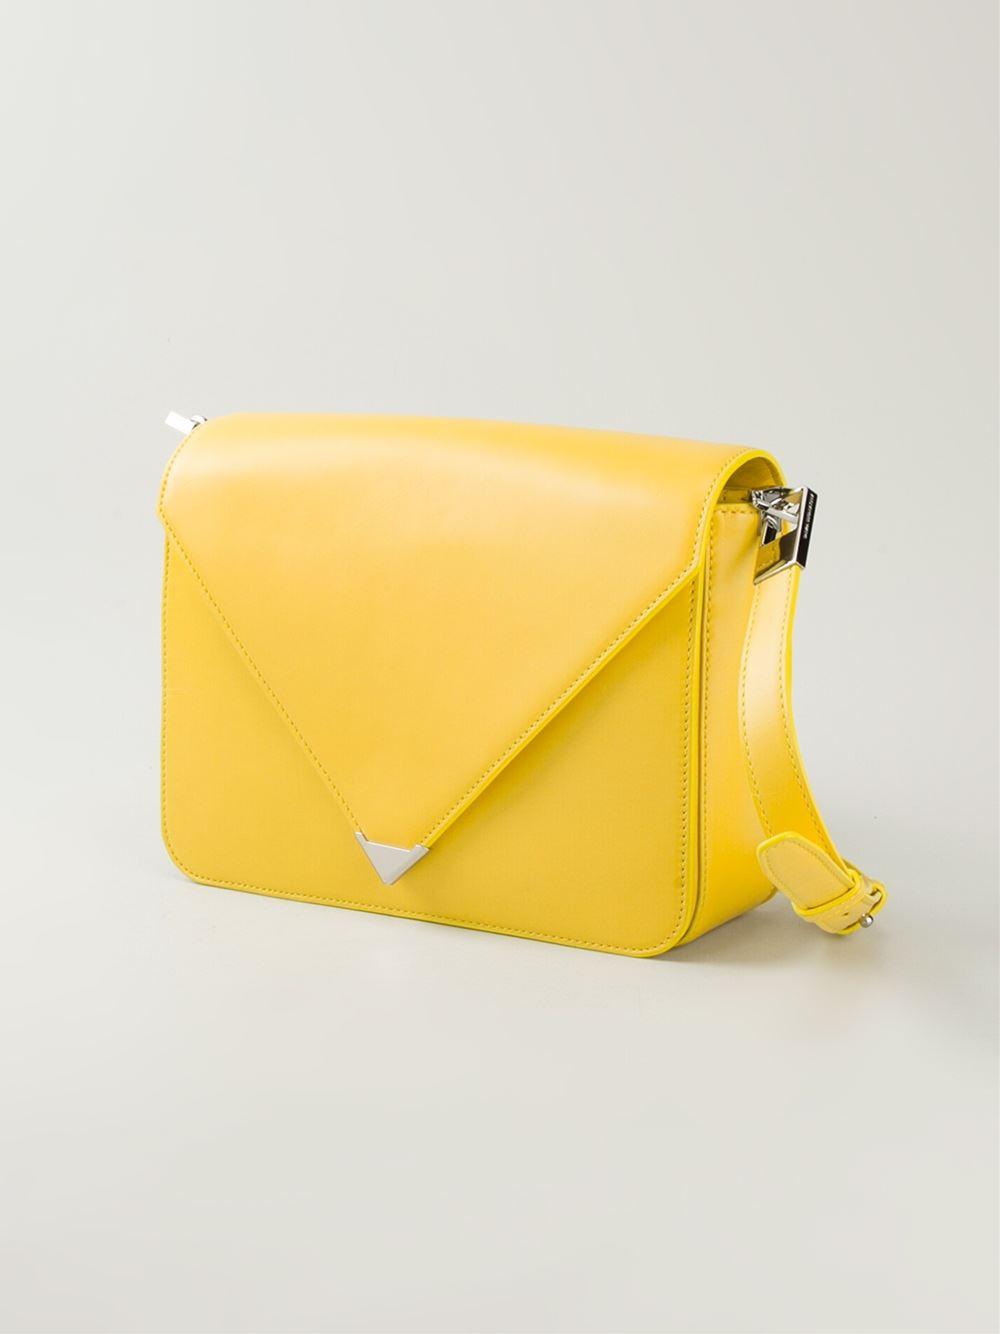 Alexander Wang Prisma Leather Cross-body Bag in Yellow & Orange (Yellow)